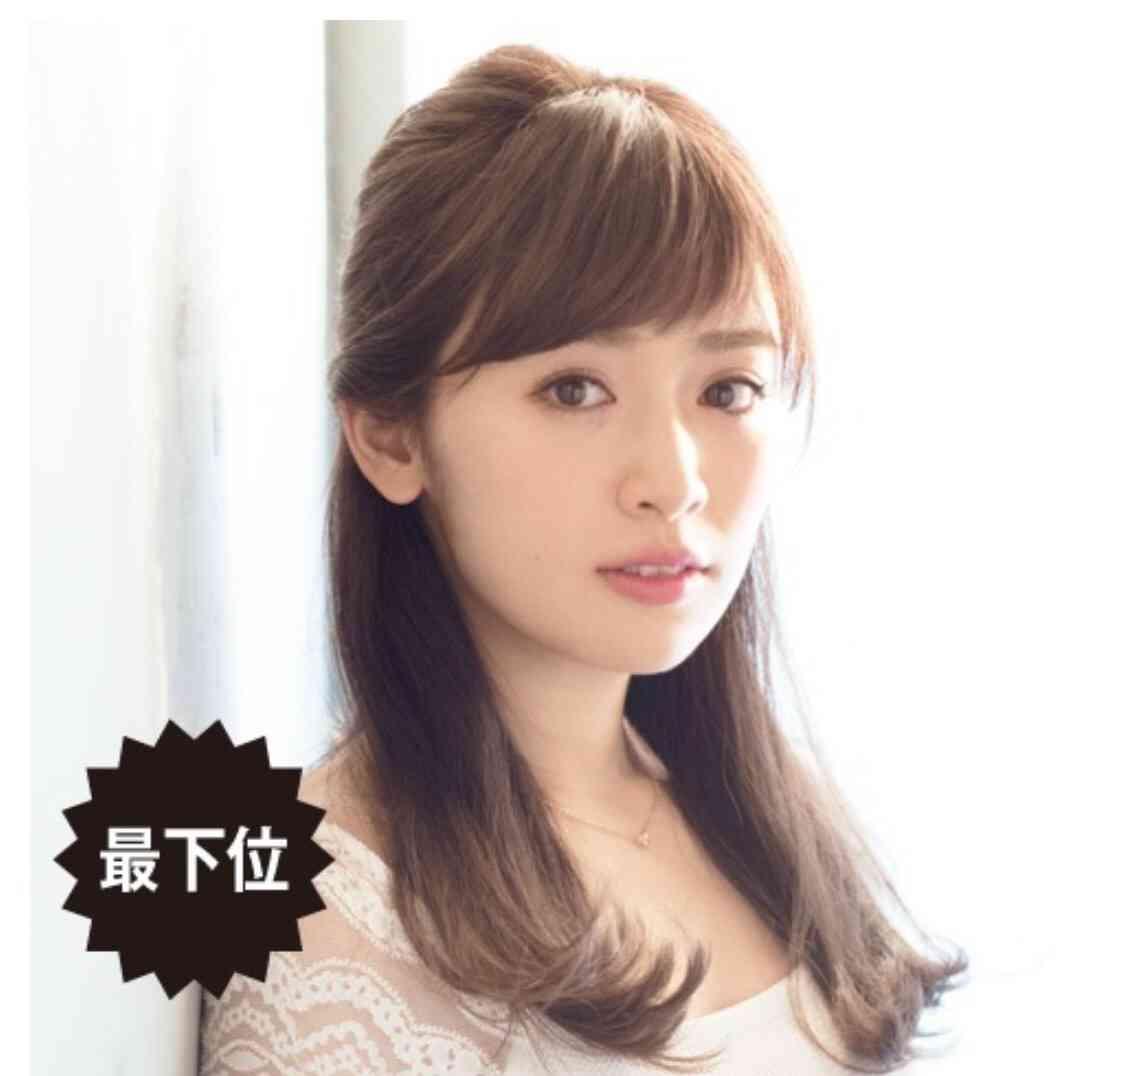 髪型 Hairstyle Japaneseclass Jp